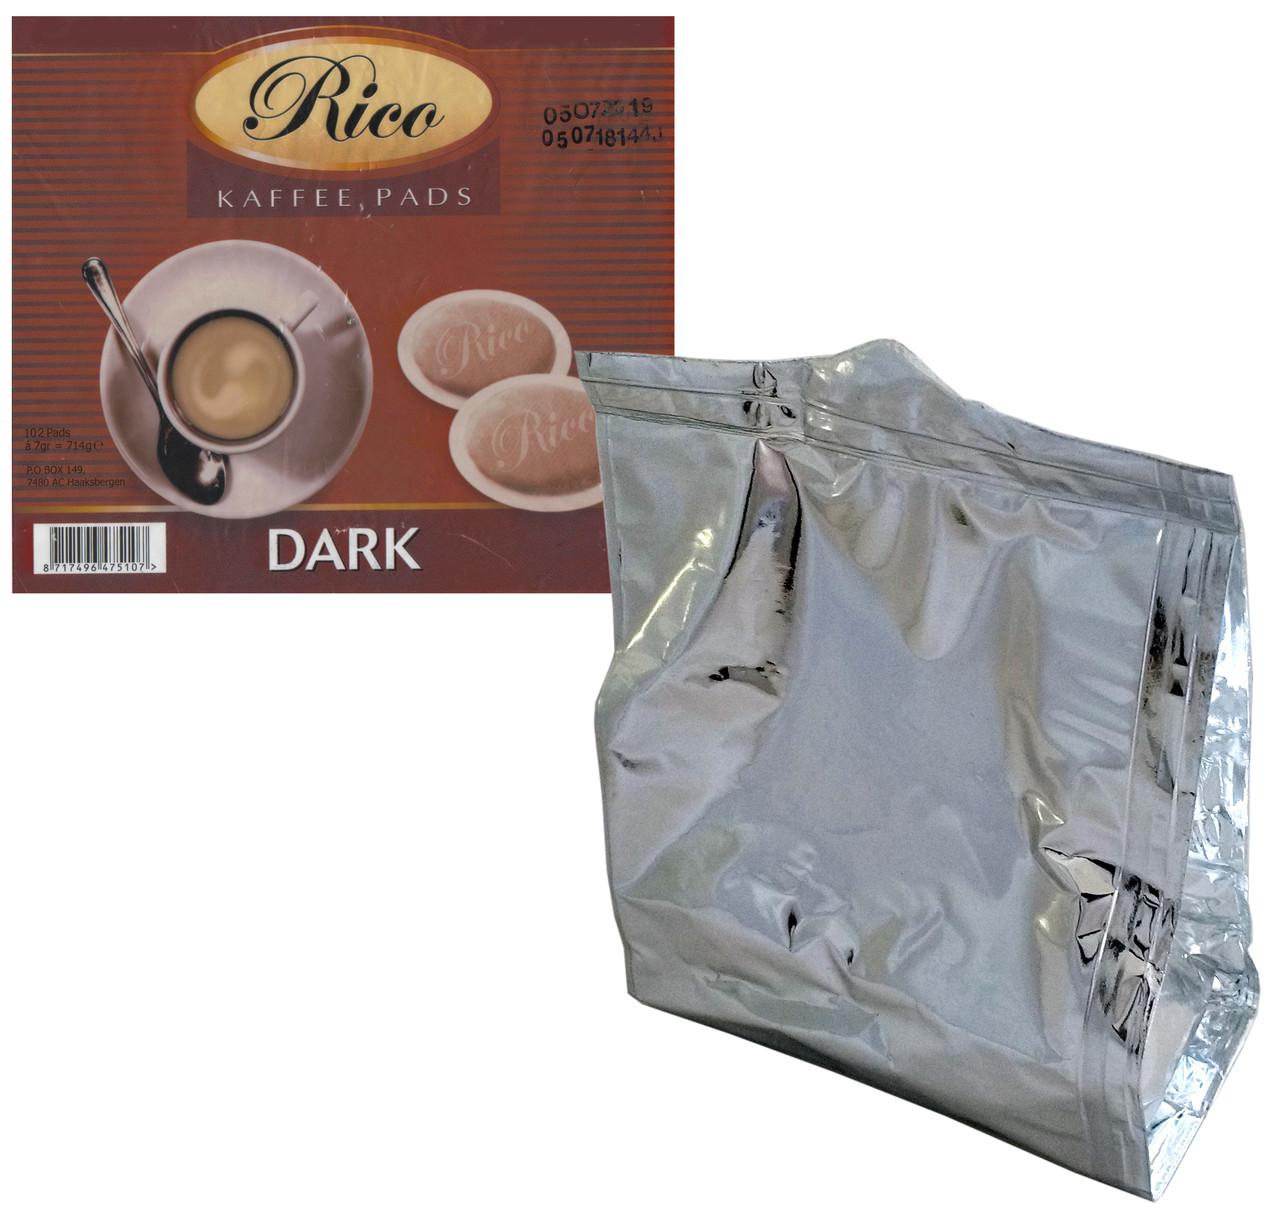 Кофе в чалдах для Philips Senseo 17 шт Rico Dark